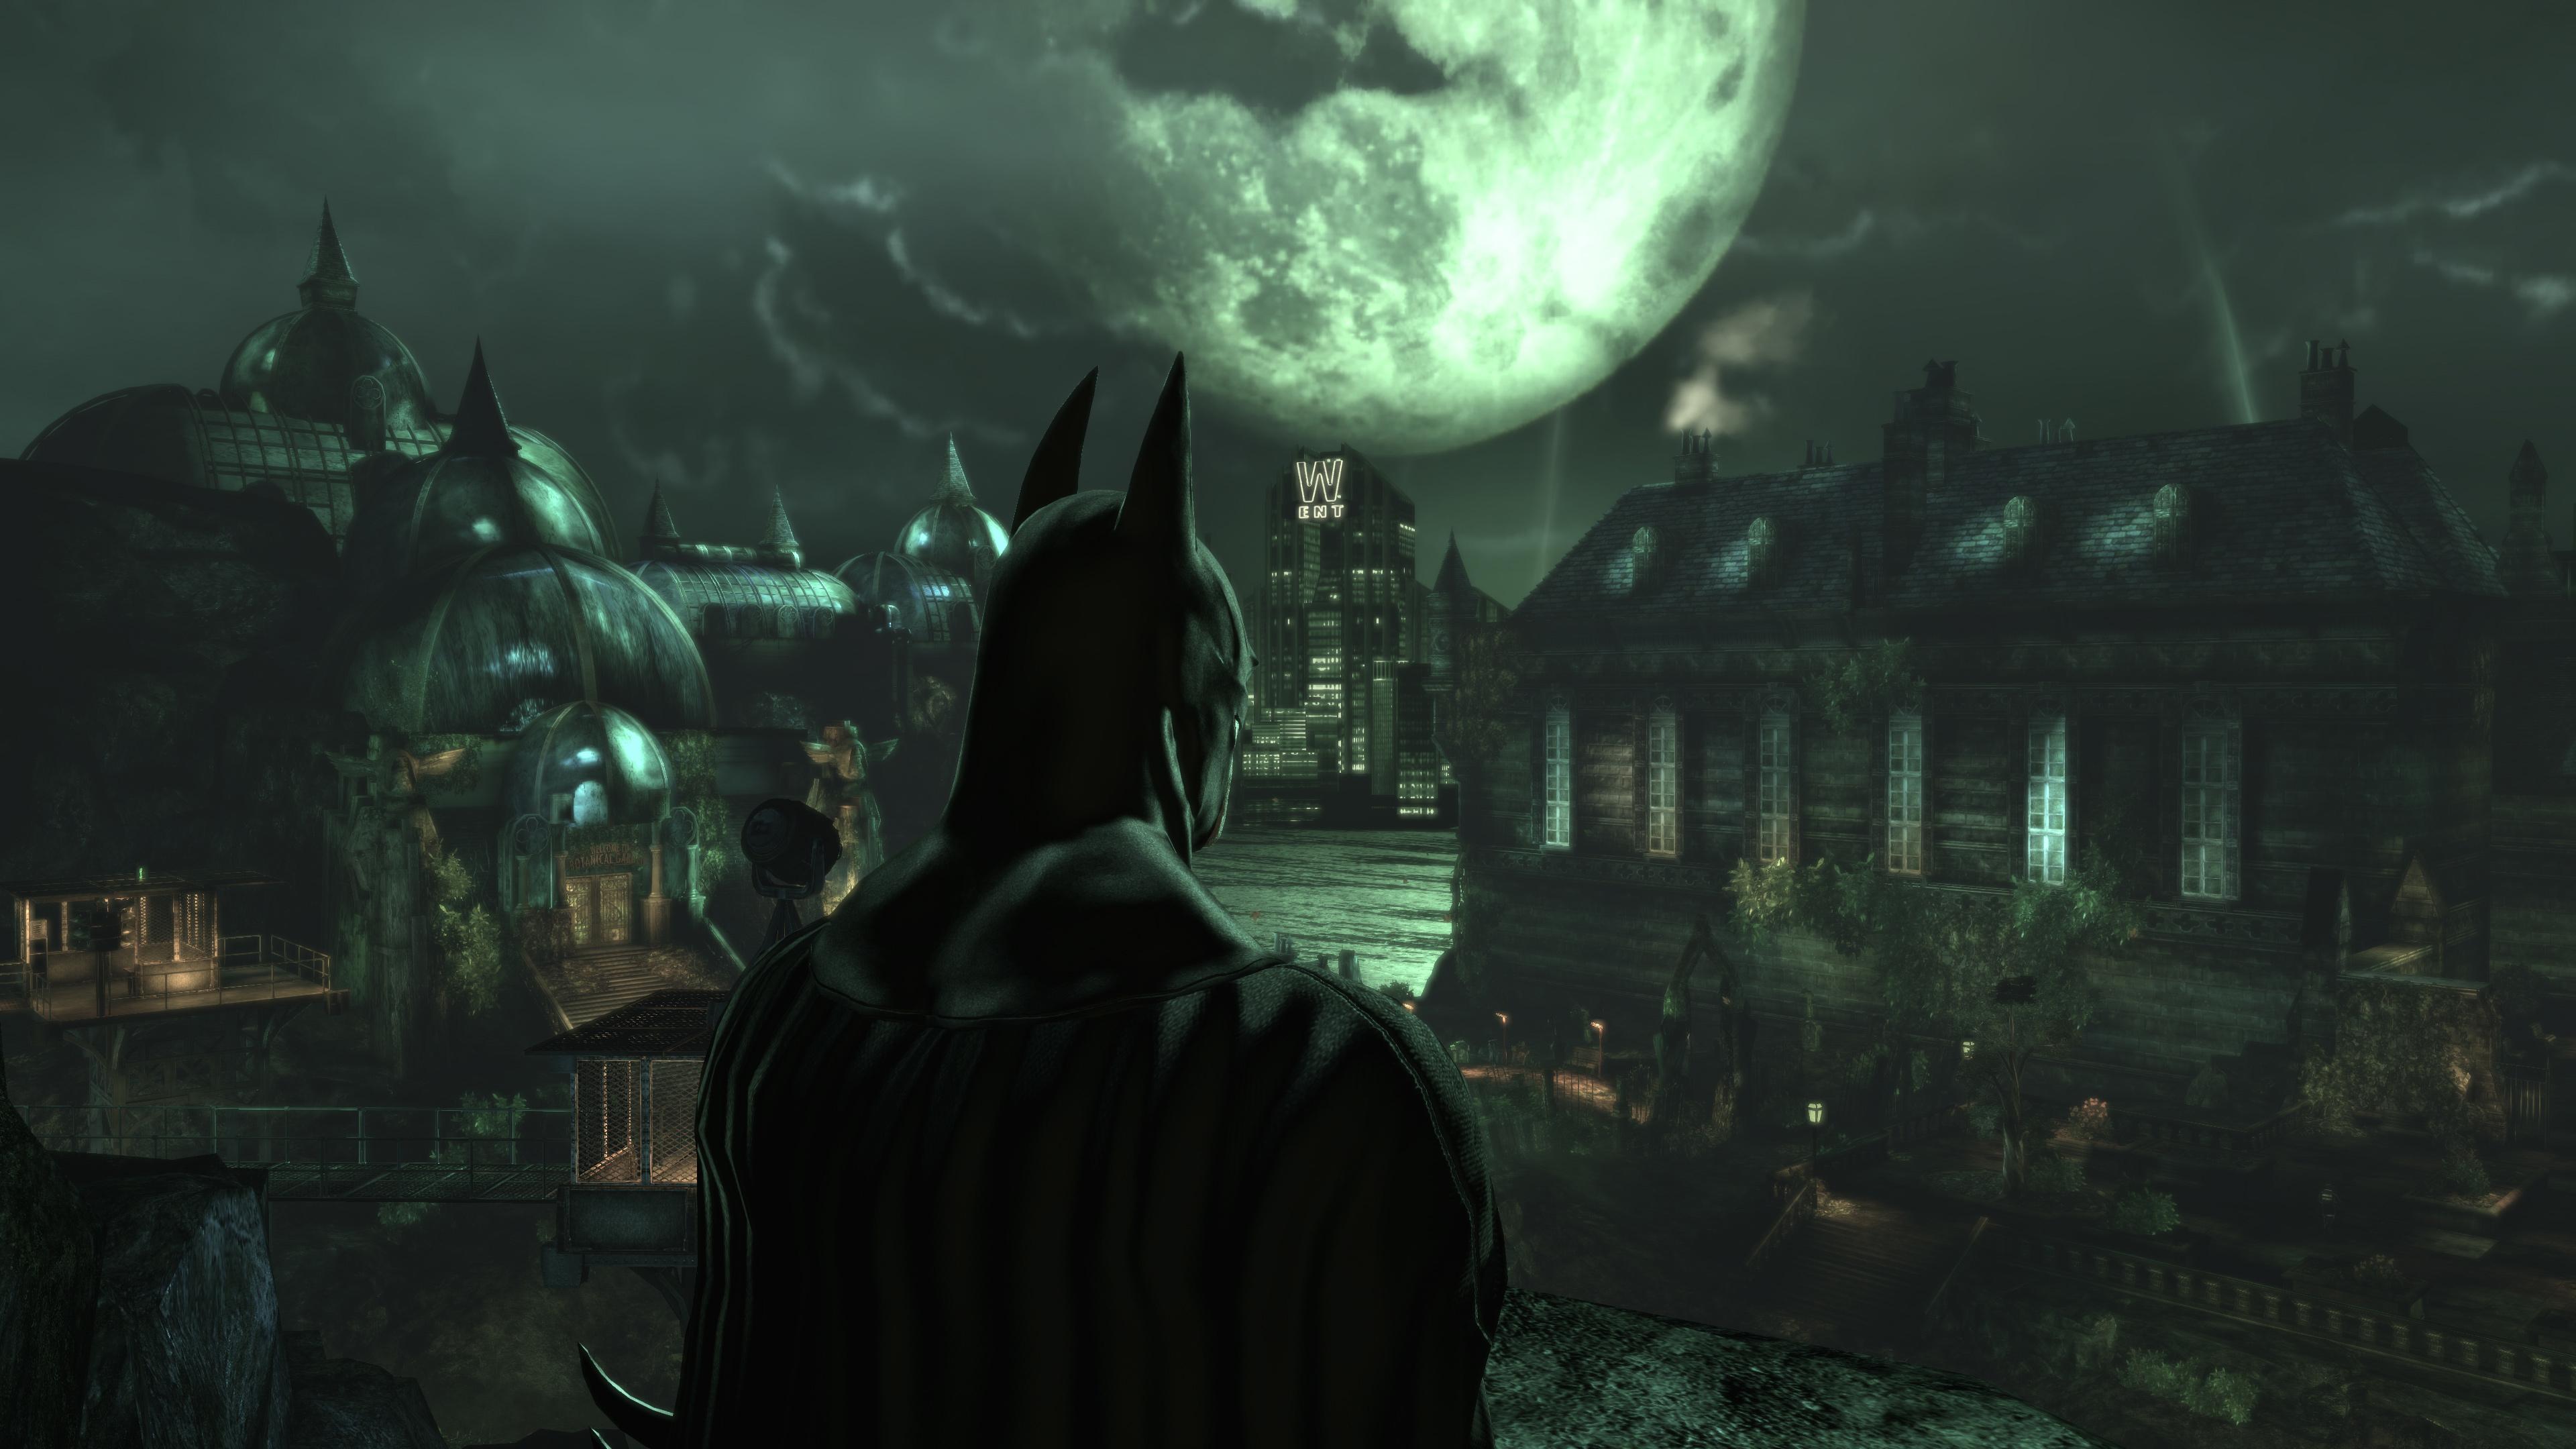 Batman Arkham Asylum Computer Wallpapers Desktop 3840x2160